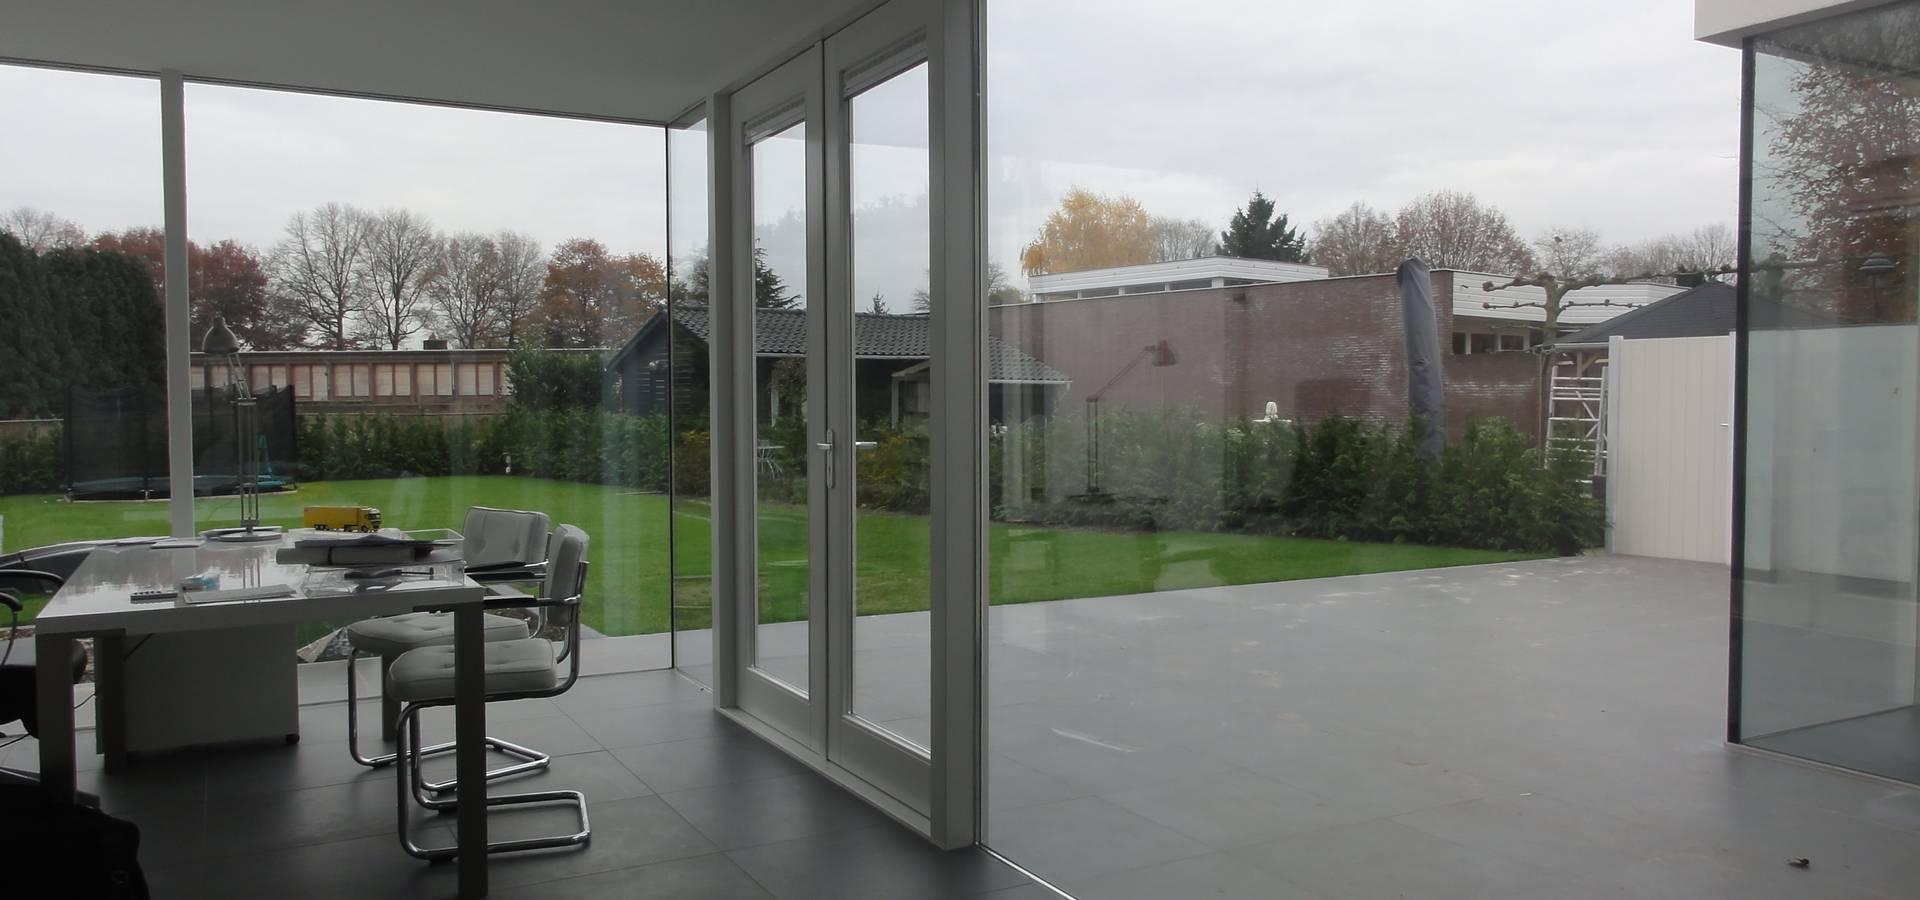 Voss architecture